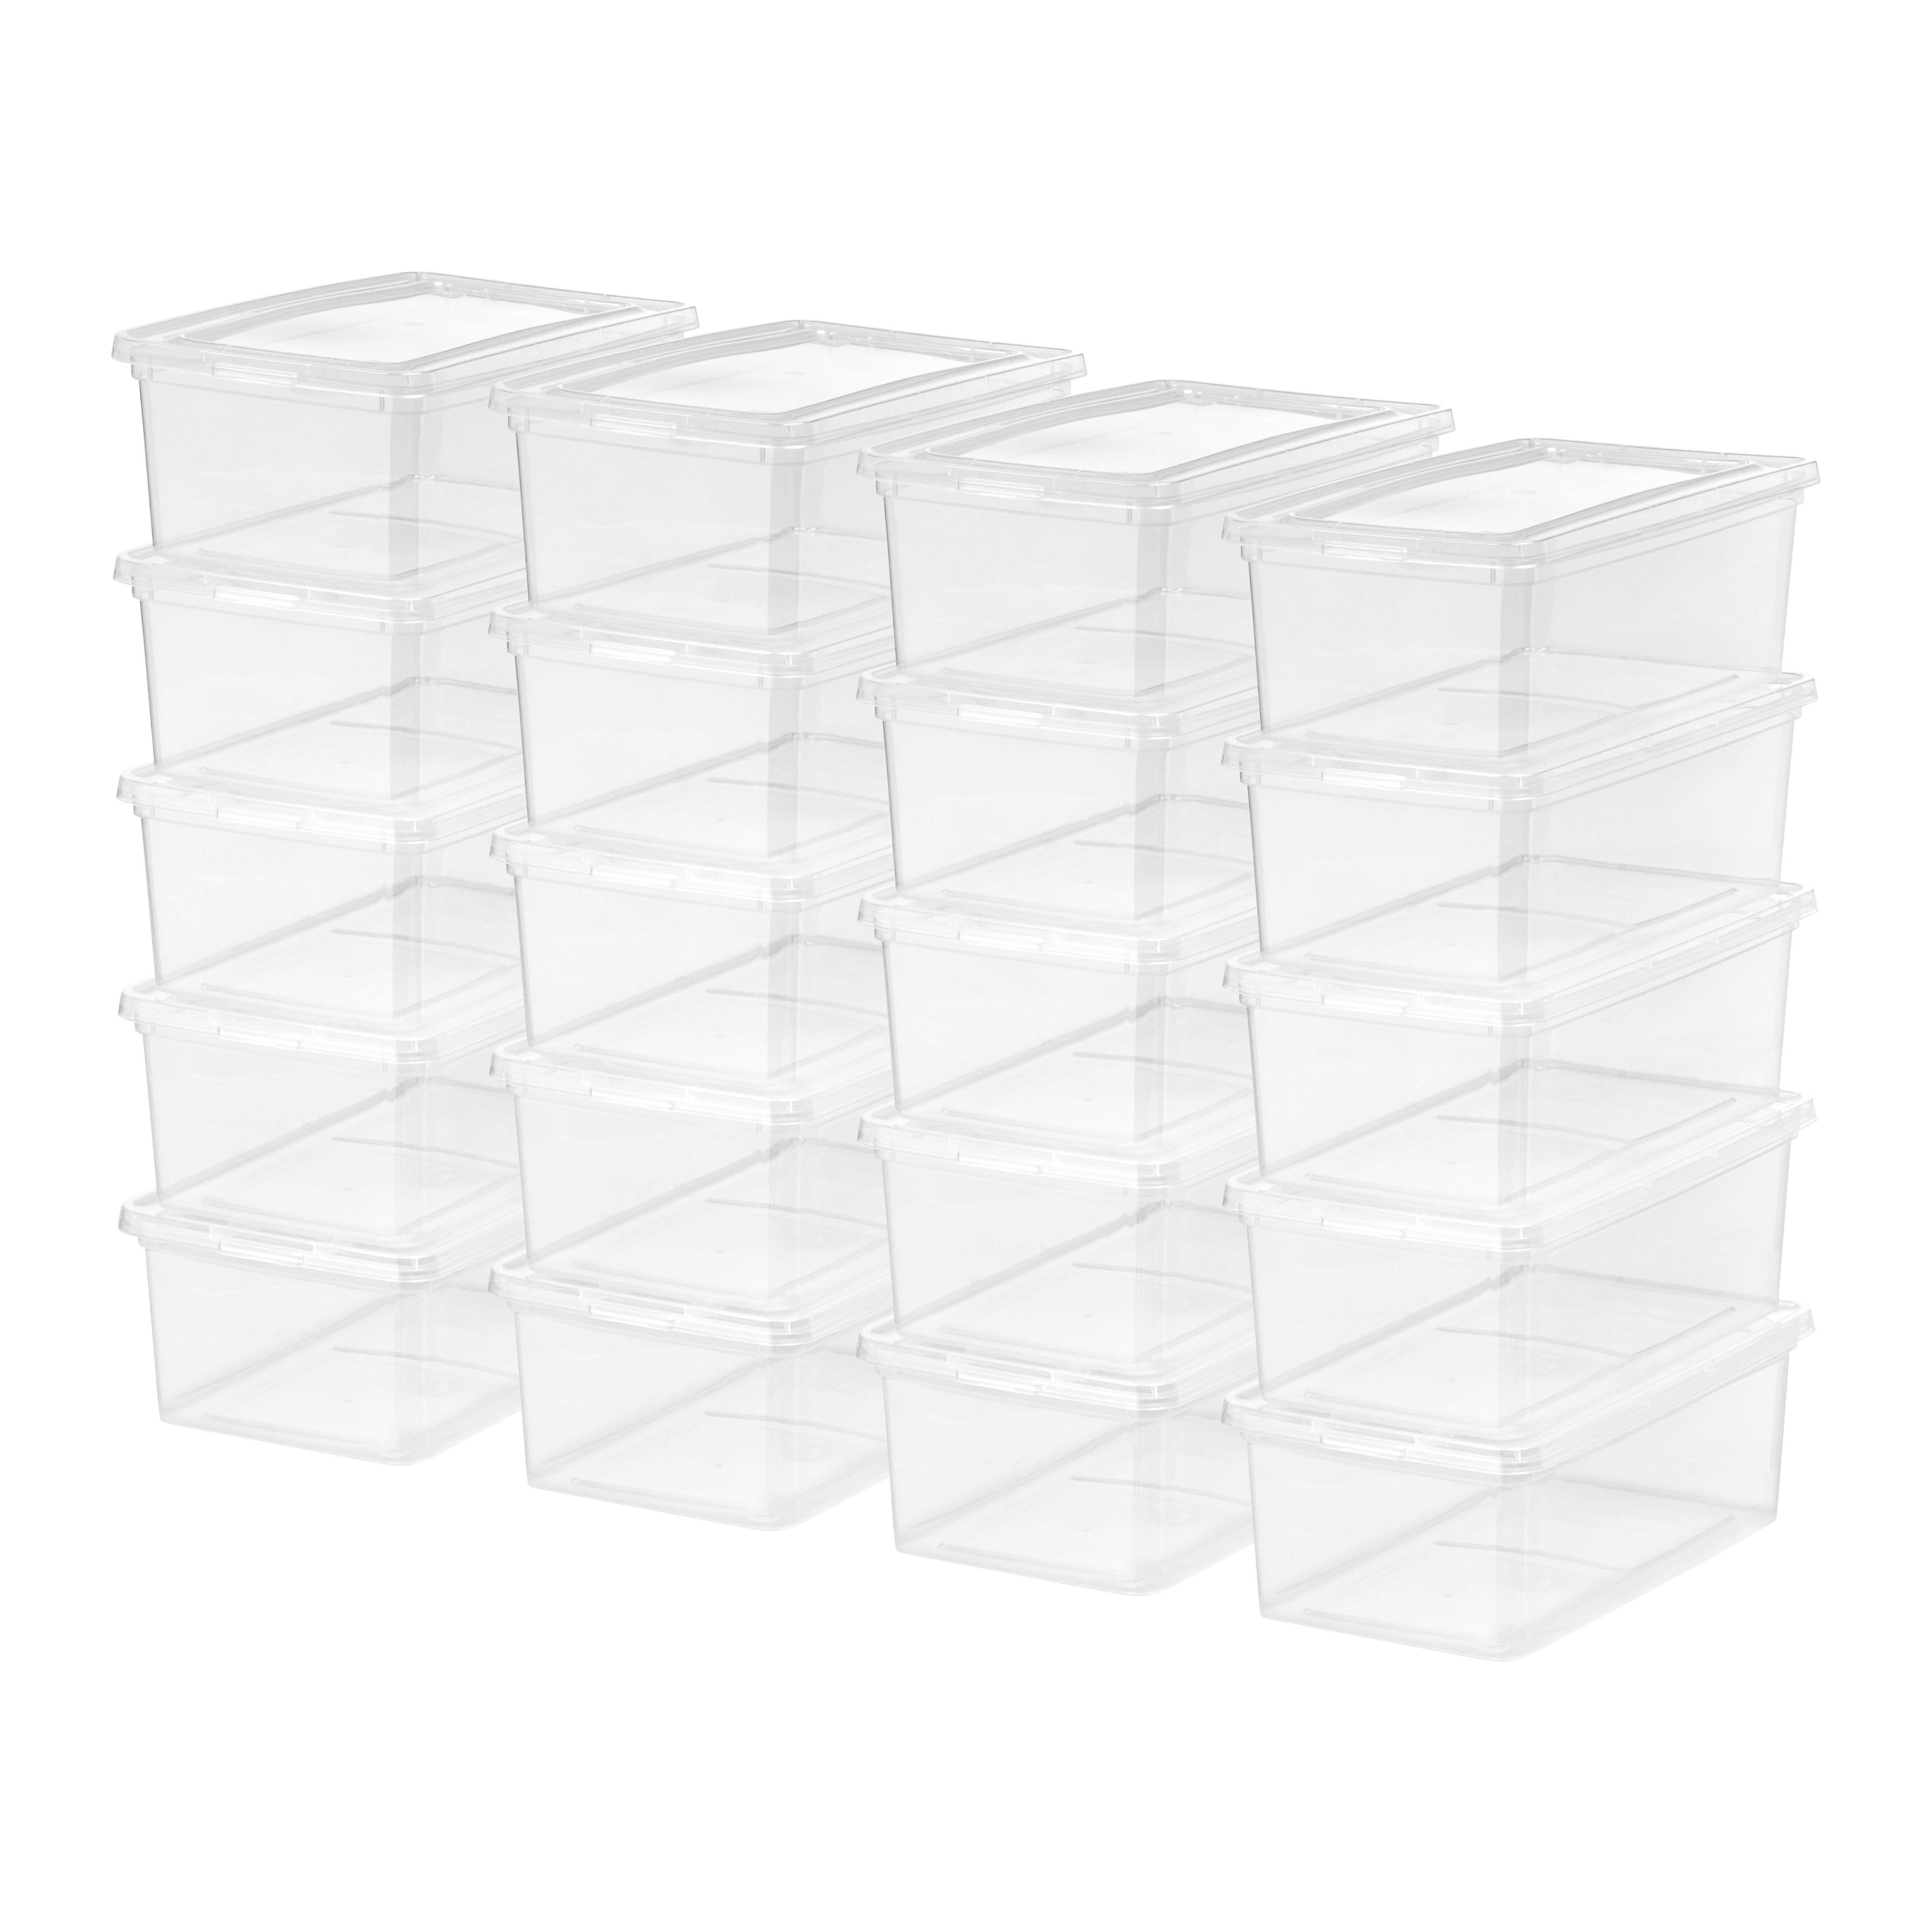 20 Pack Mainstays 5 Quart/1.25 Gallon Shoe Box Storage